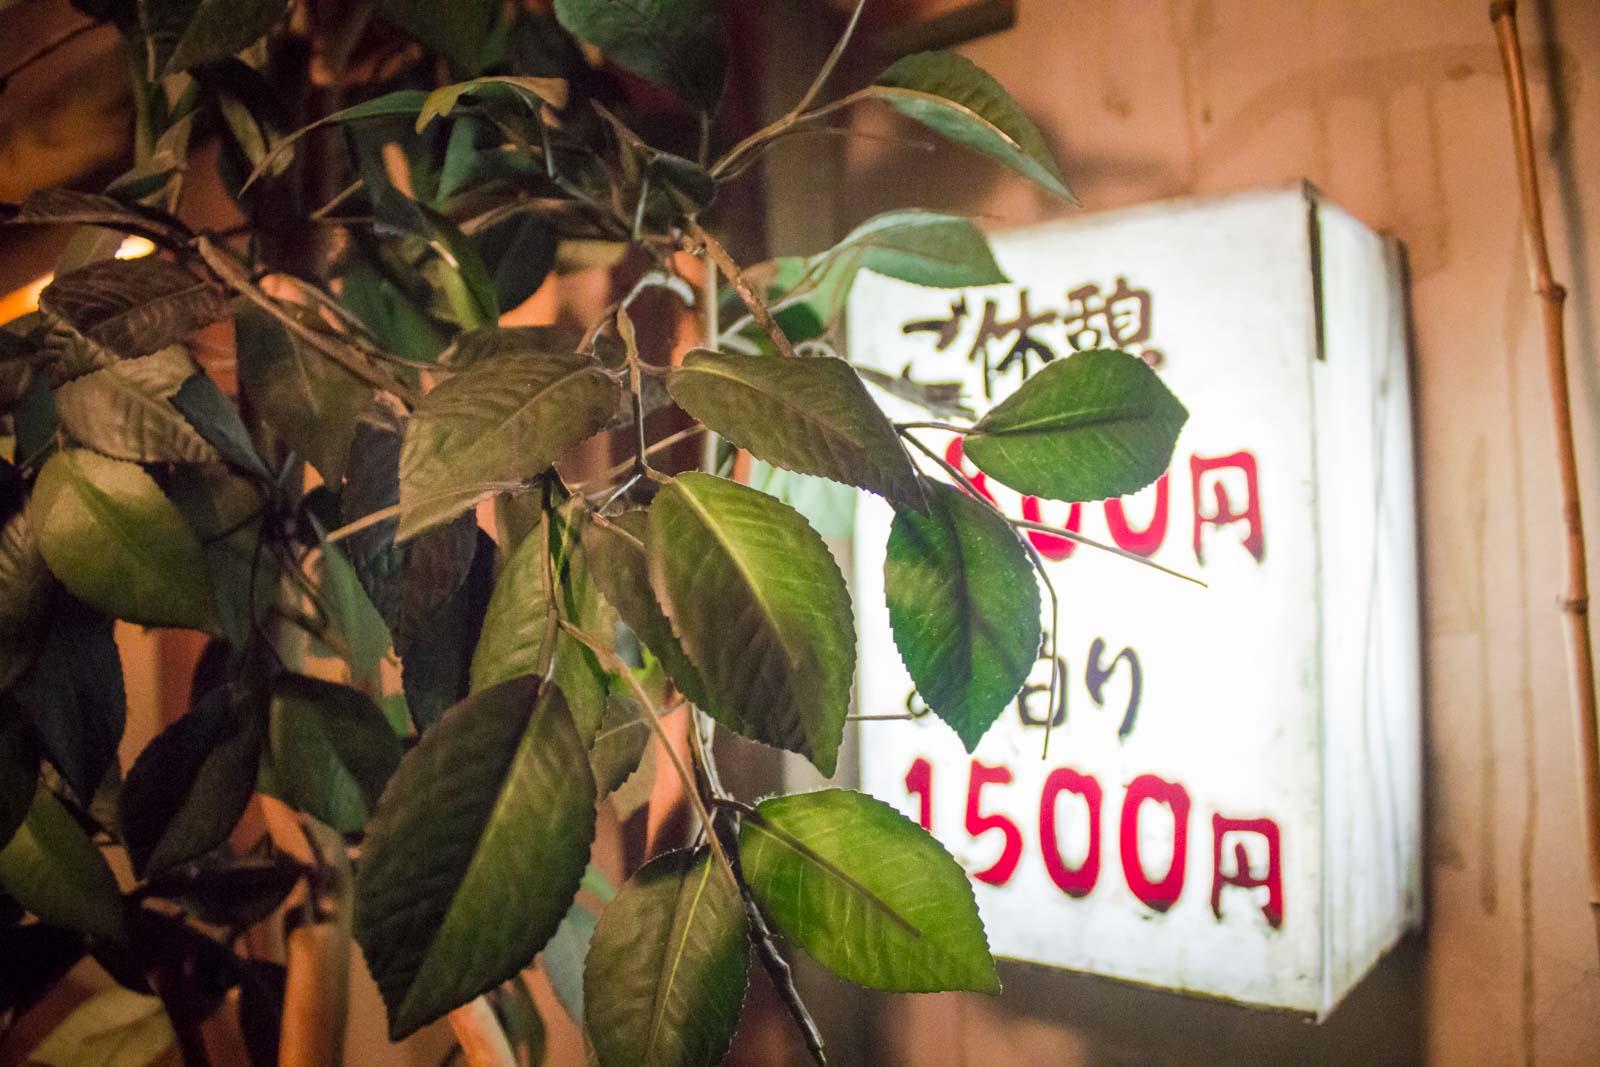 ramen museum, yokohama, japan, shin-yokohama raumen museum